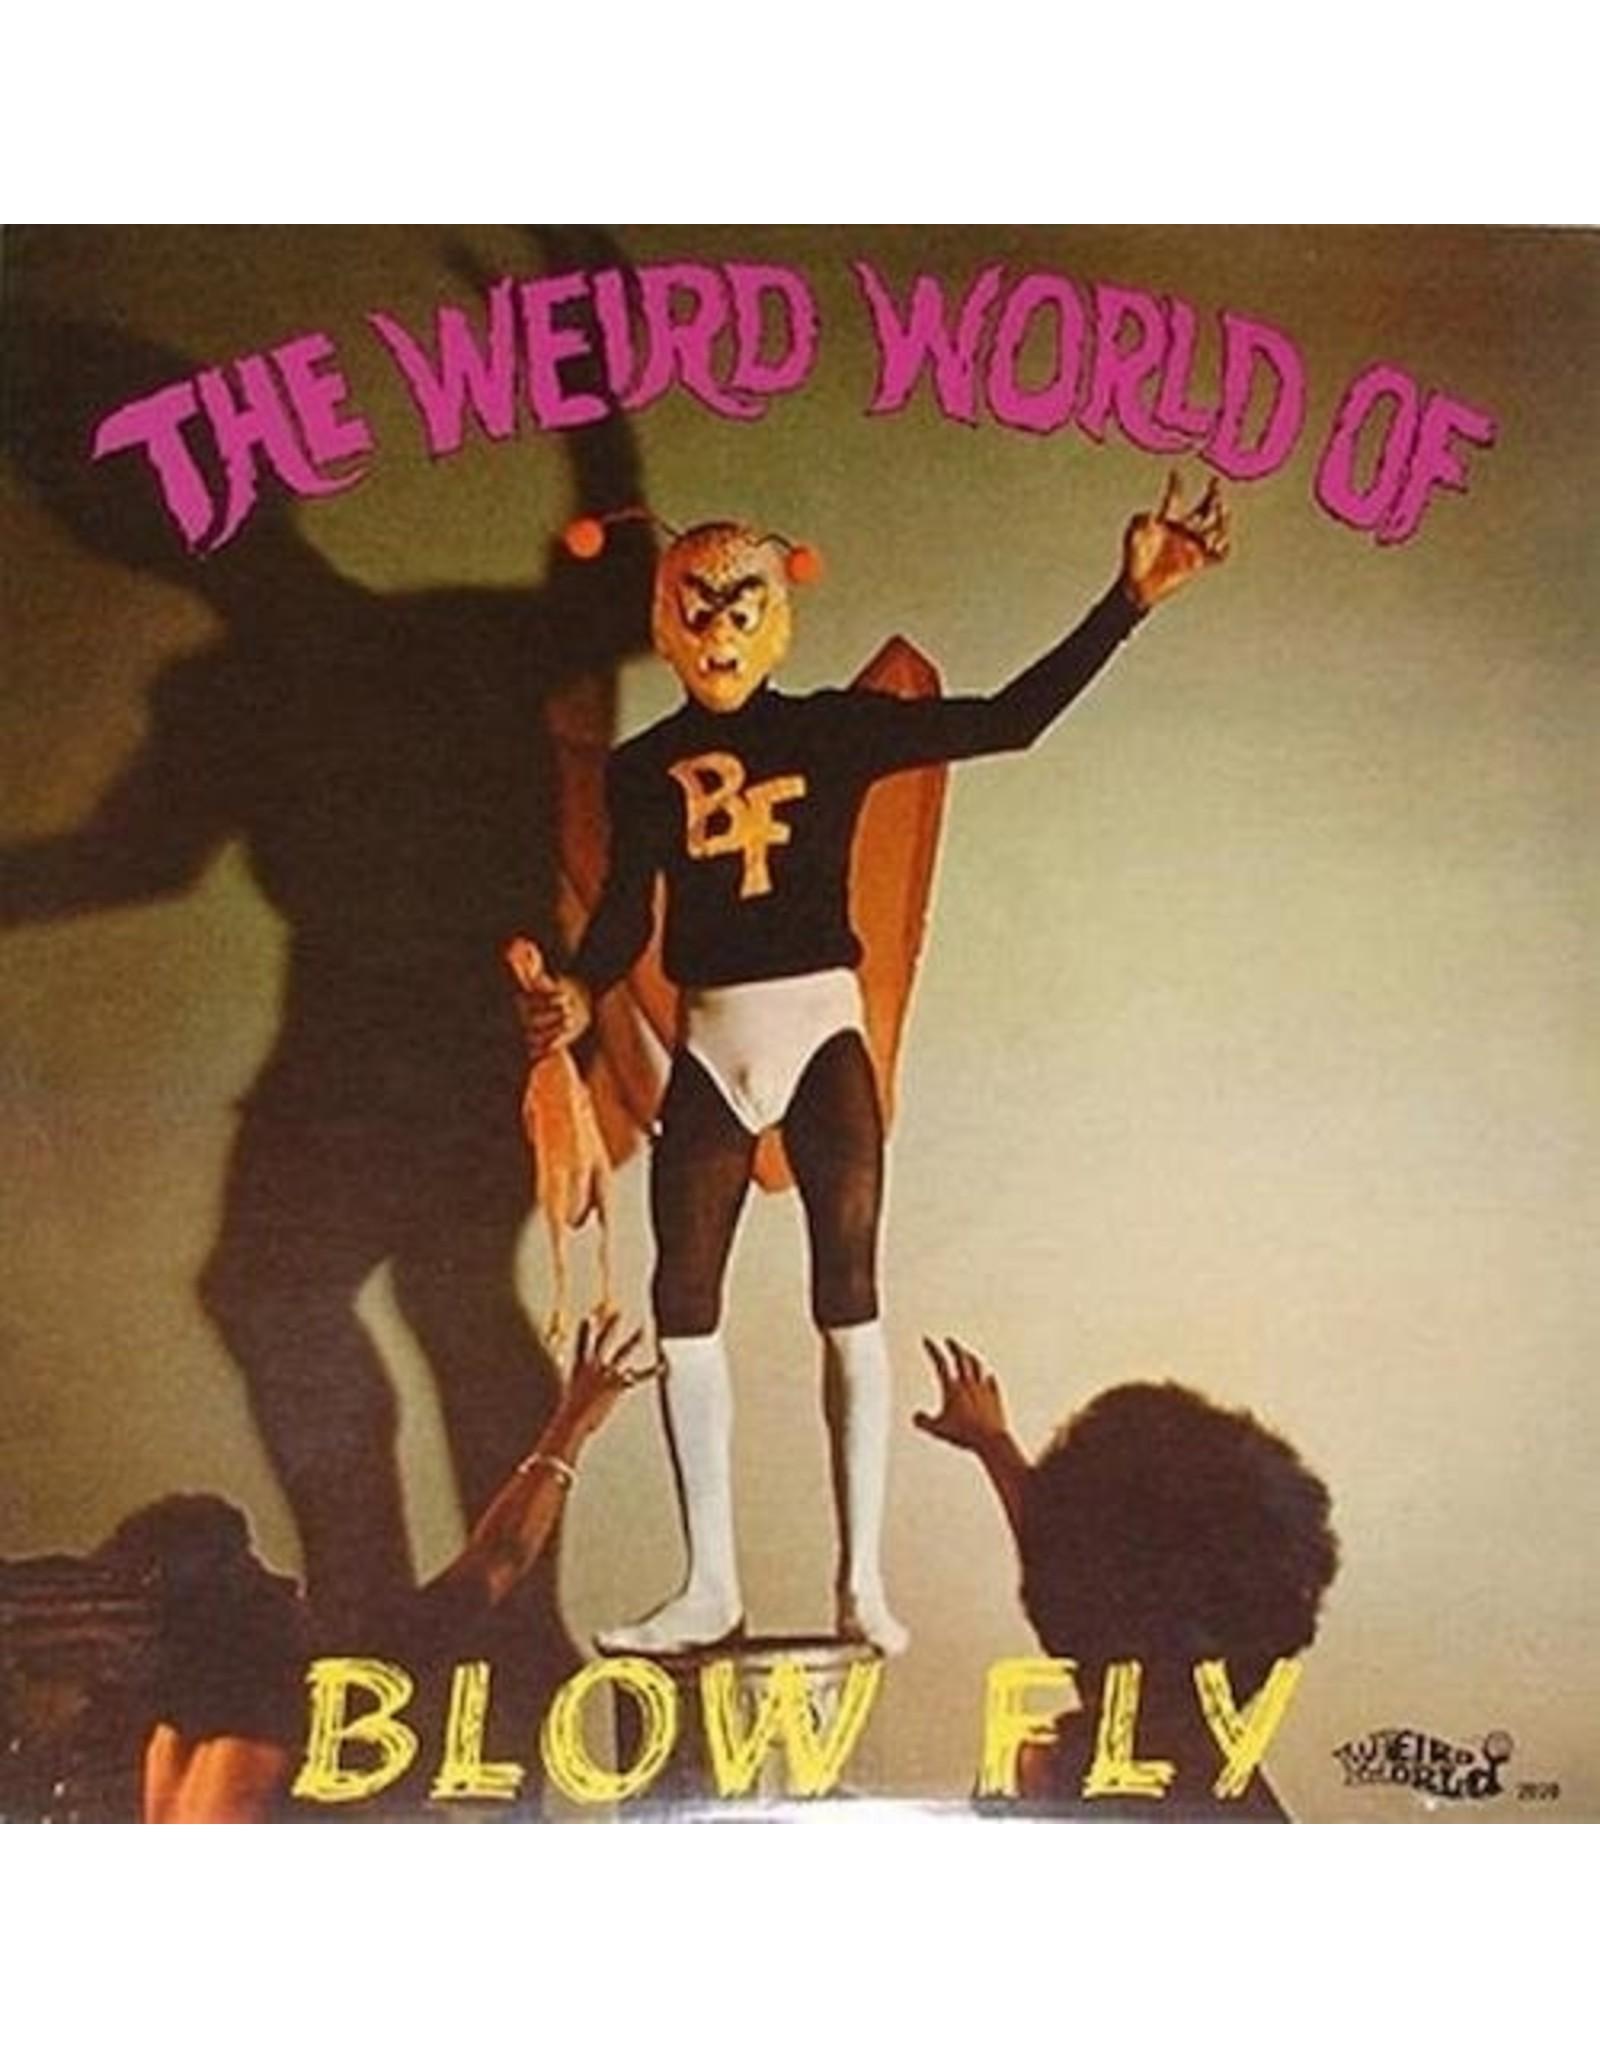 New Vinyl Blowfly - Weird World Of Blowfly LP